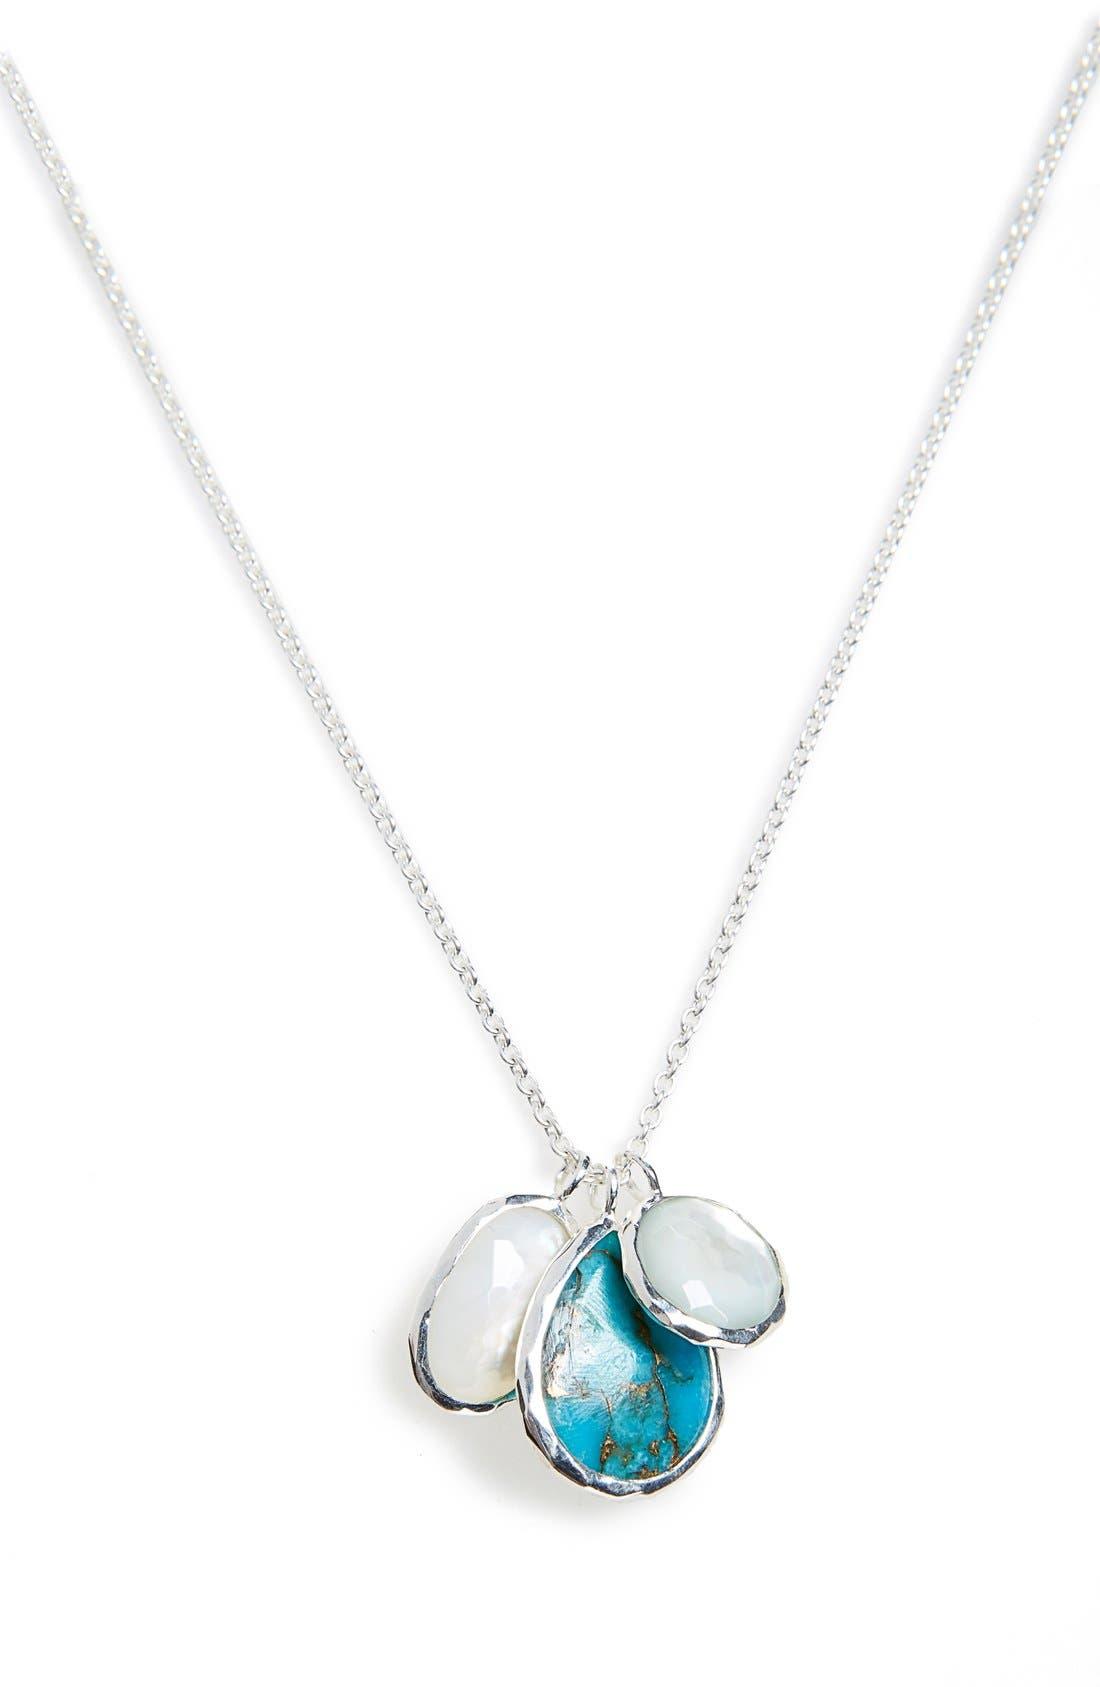 Main Image - Ippolita 'Wonderland' Triple Charm Necklace (Nordstrom Exclusive)